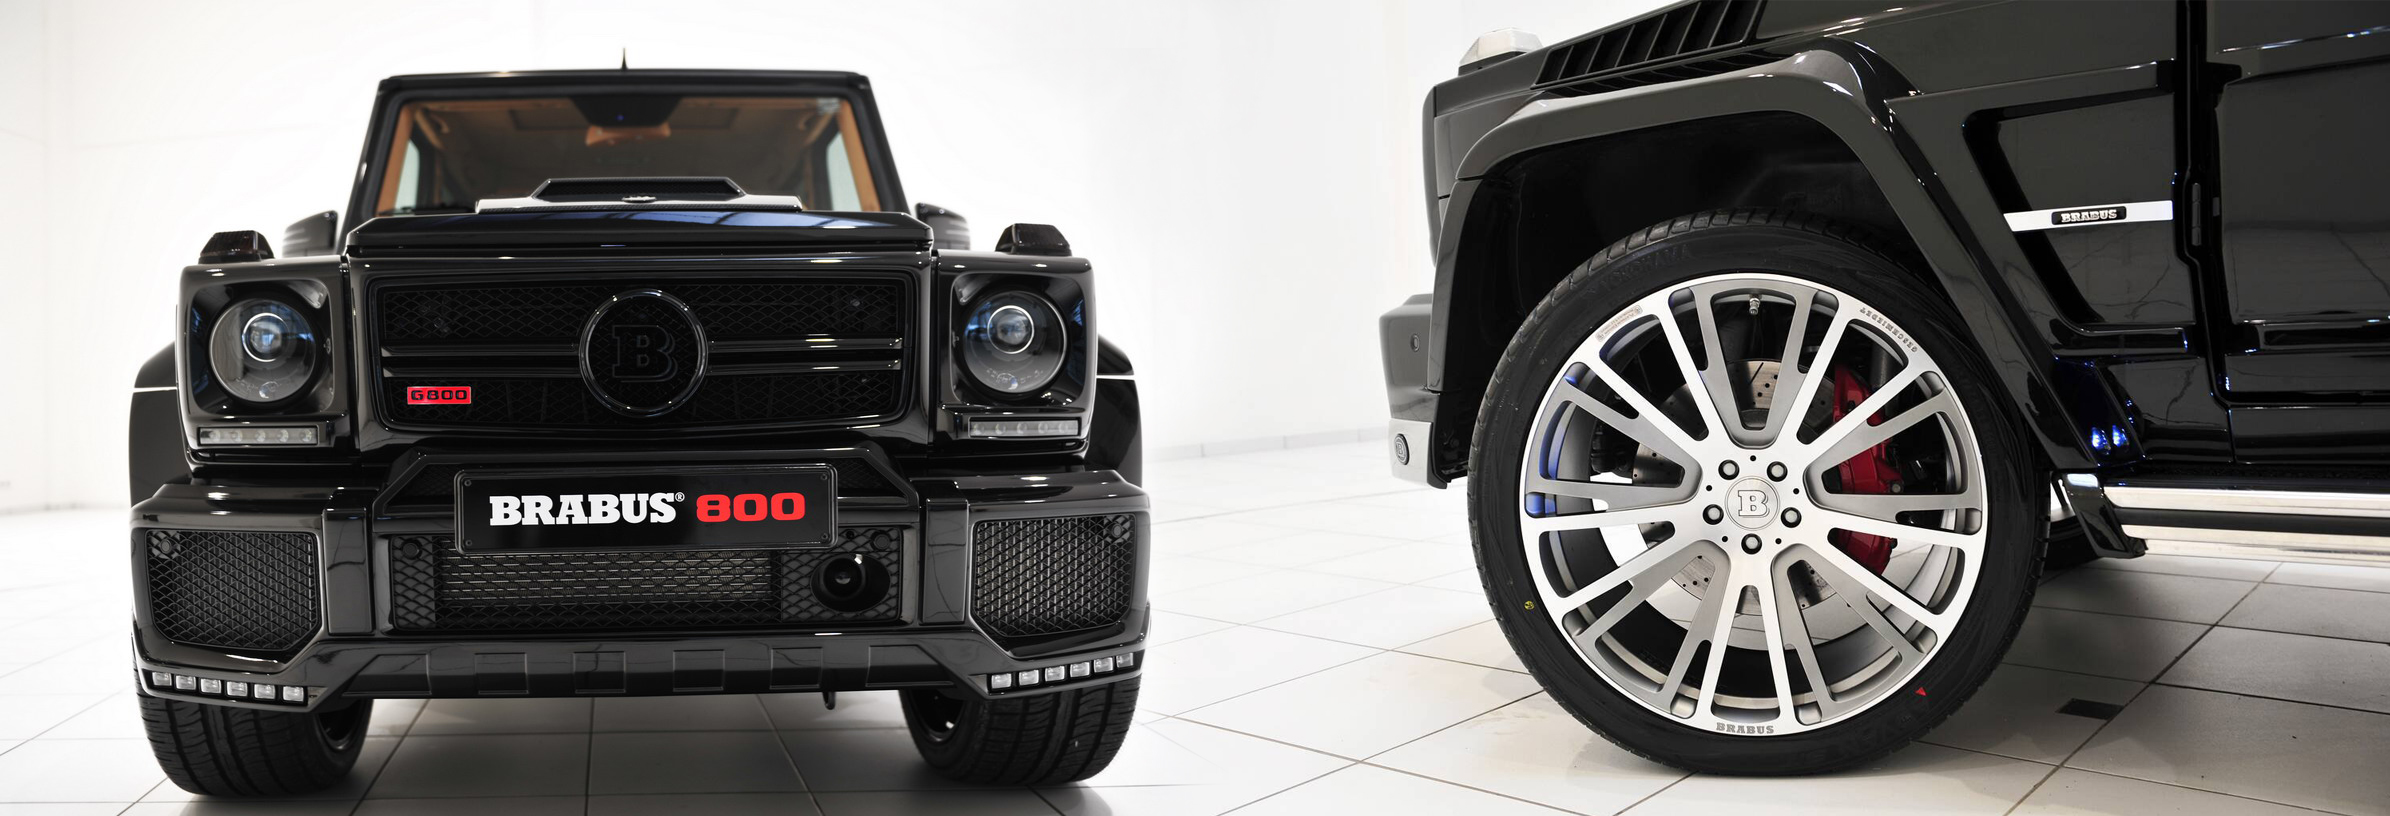 Brabus 800 2013 mercedes G65